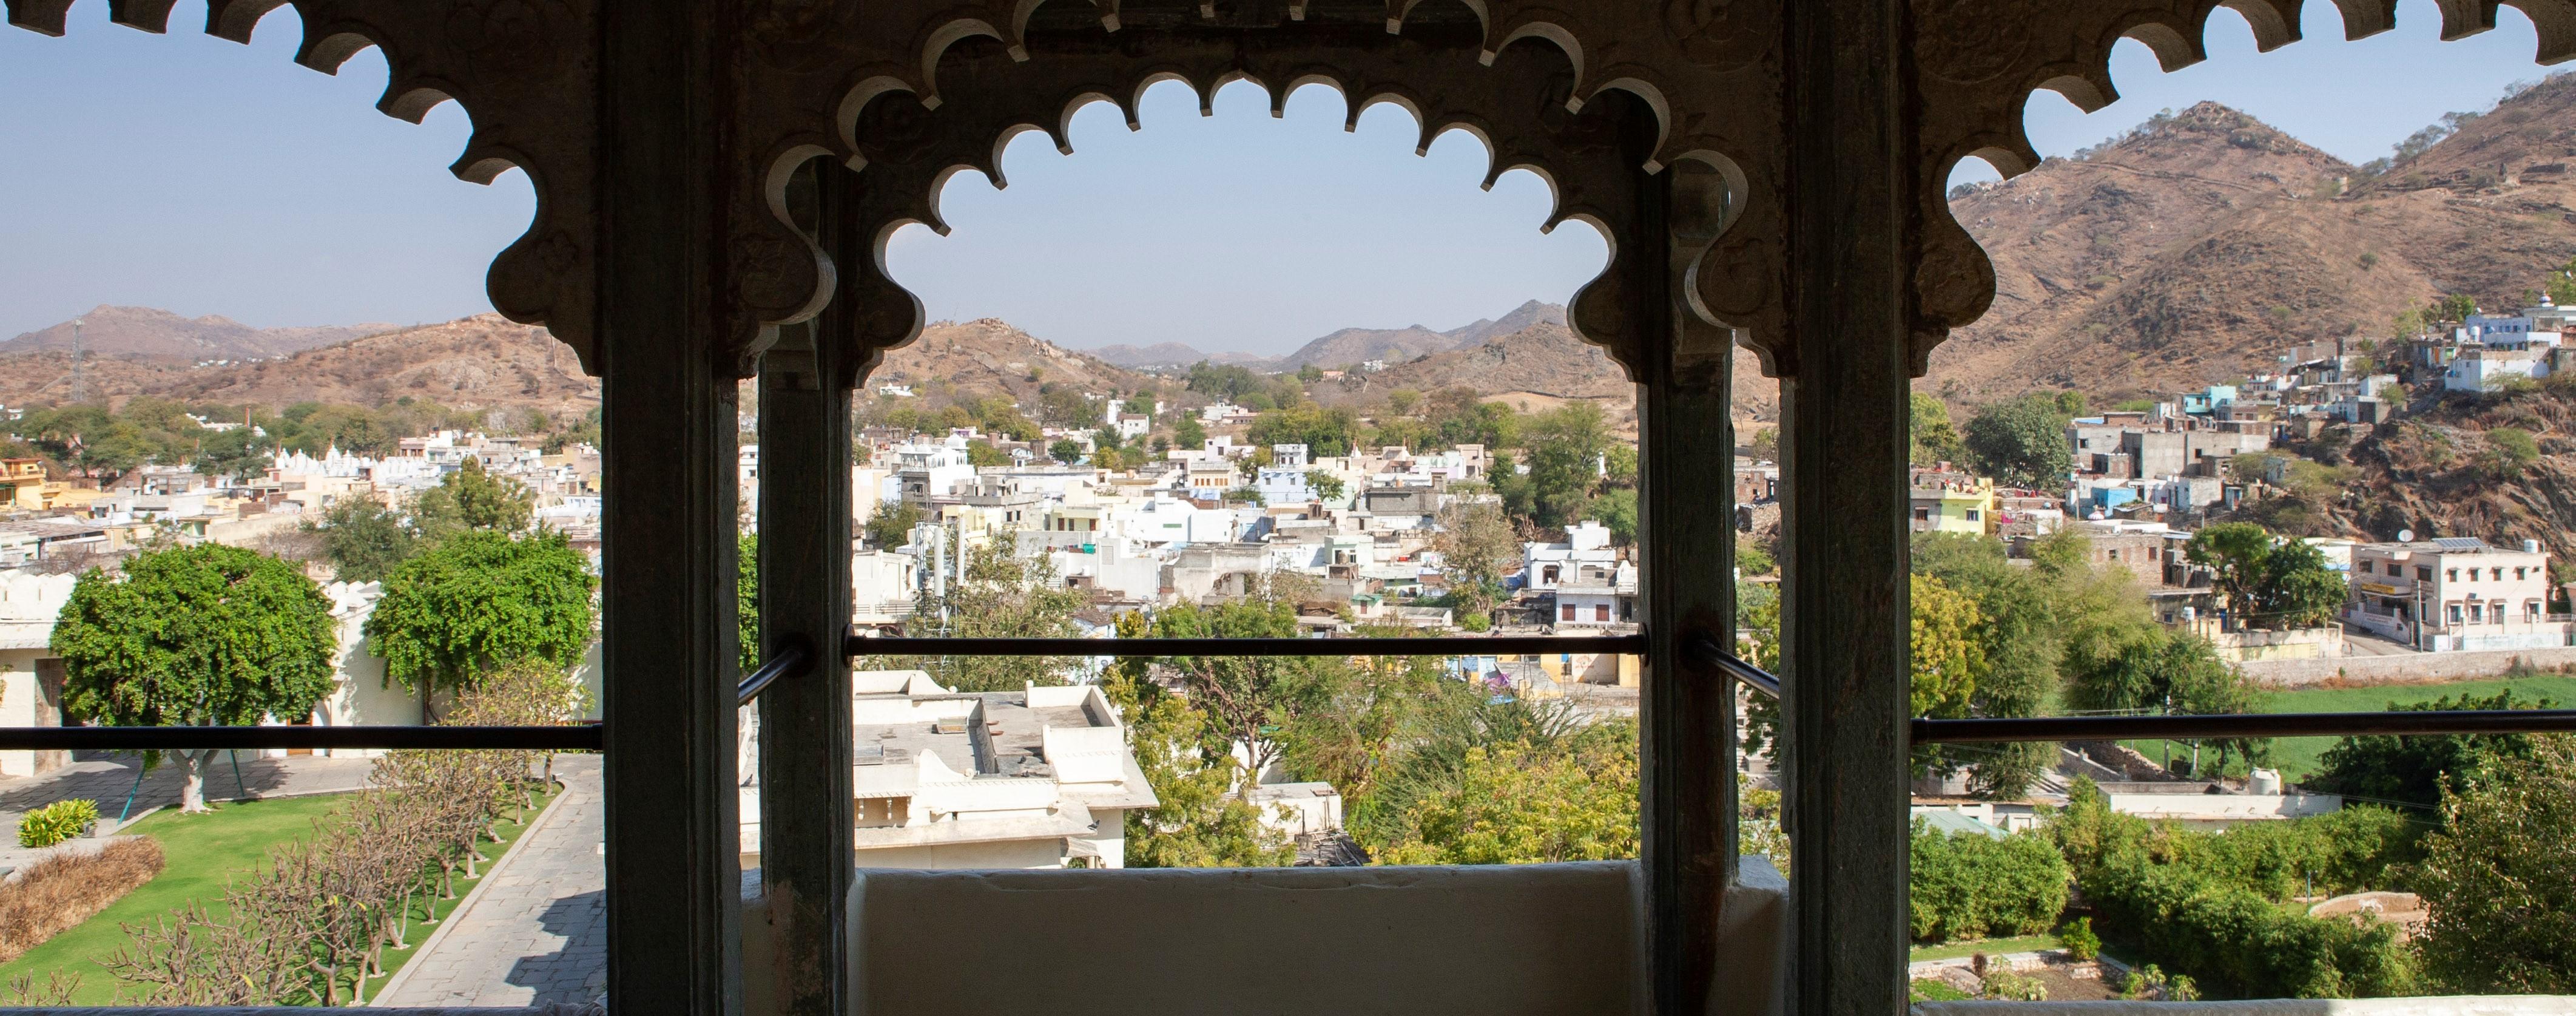 raas-devigarh-Rooftop-balcony